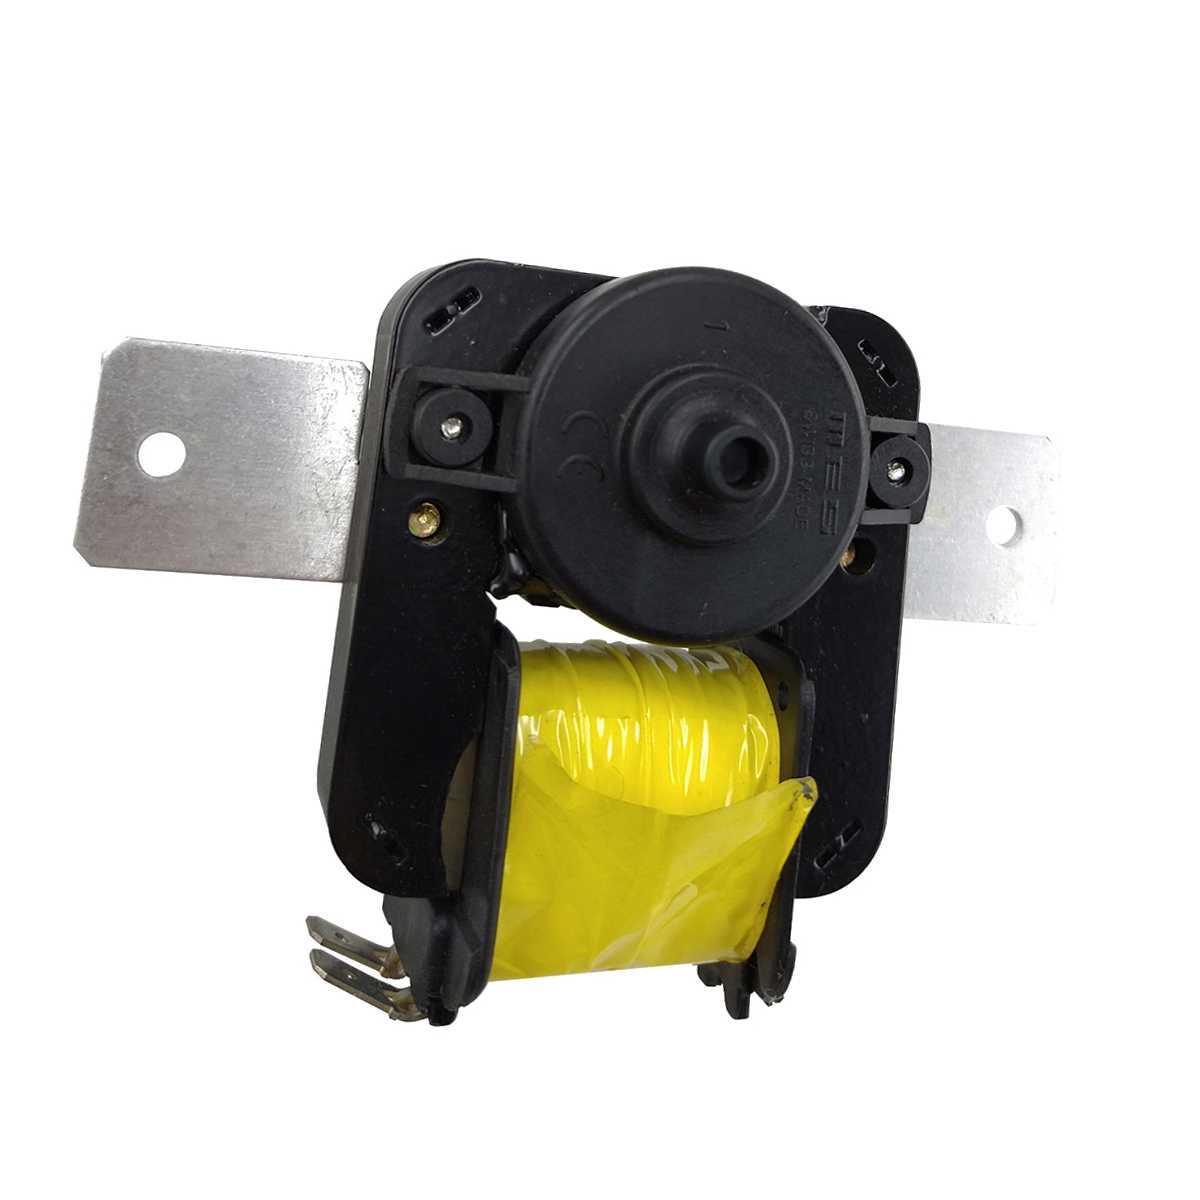 Motor ventilador 220v geladeira Brastemp